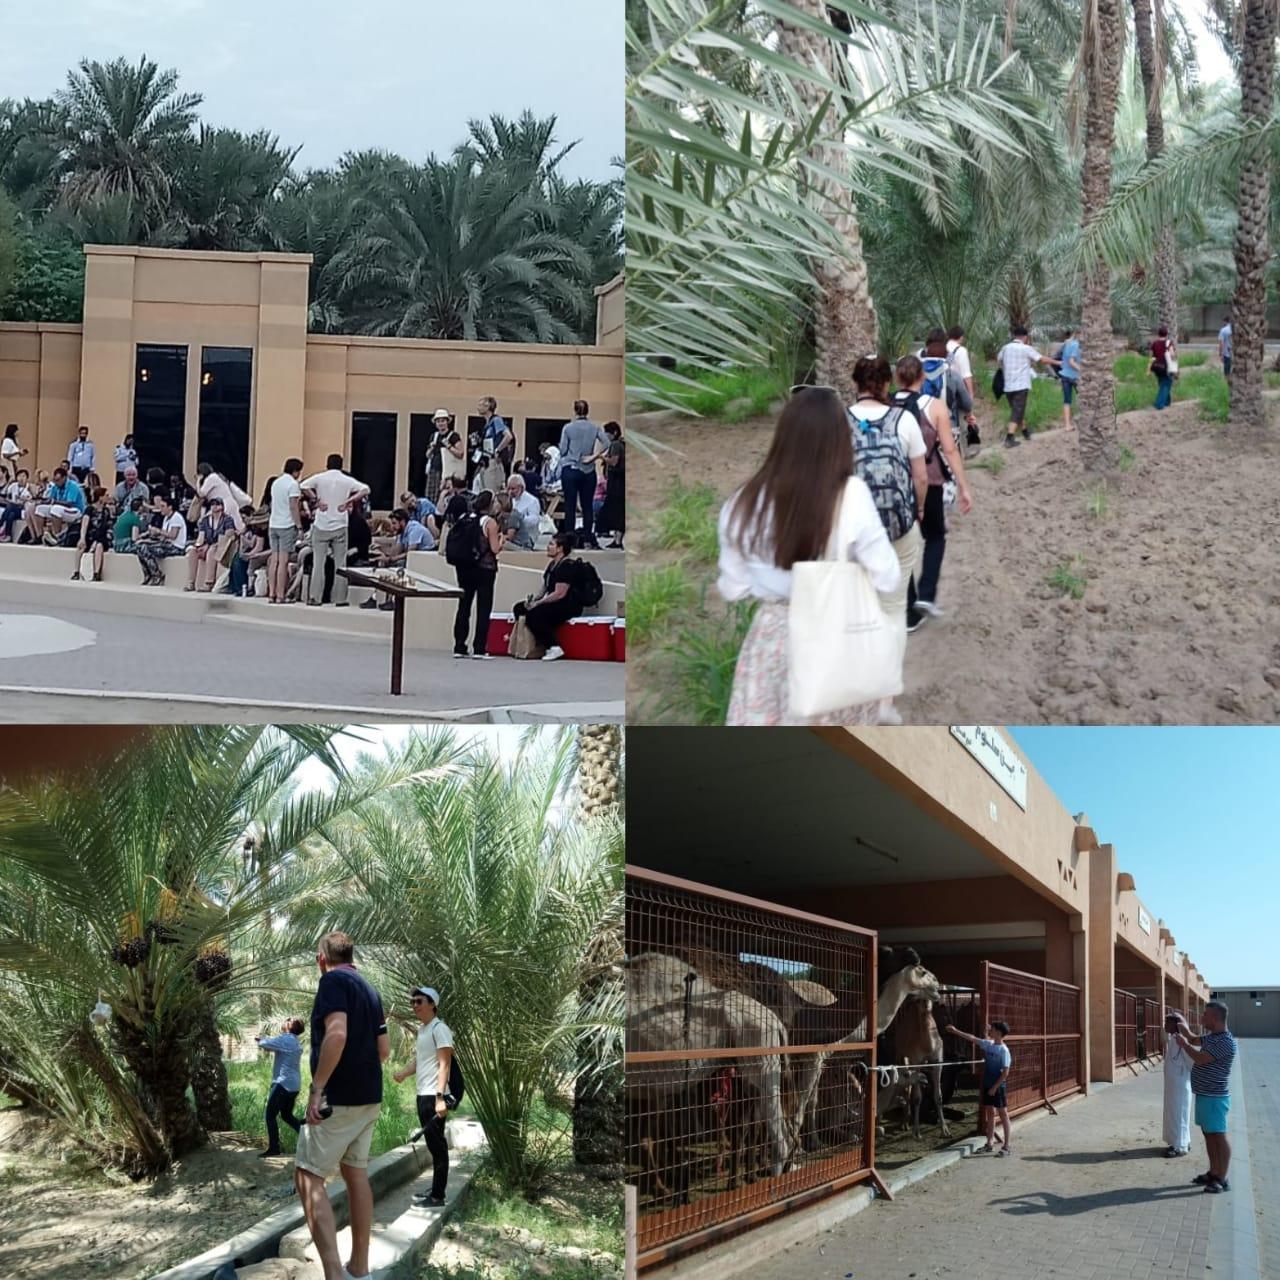 AL ain tour in abudhabi